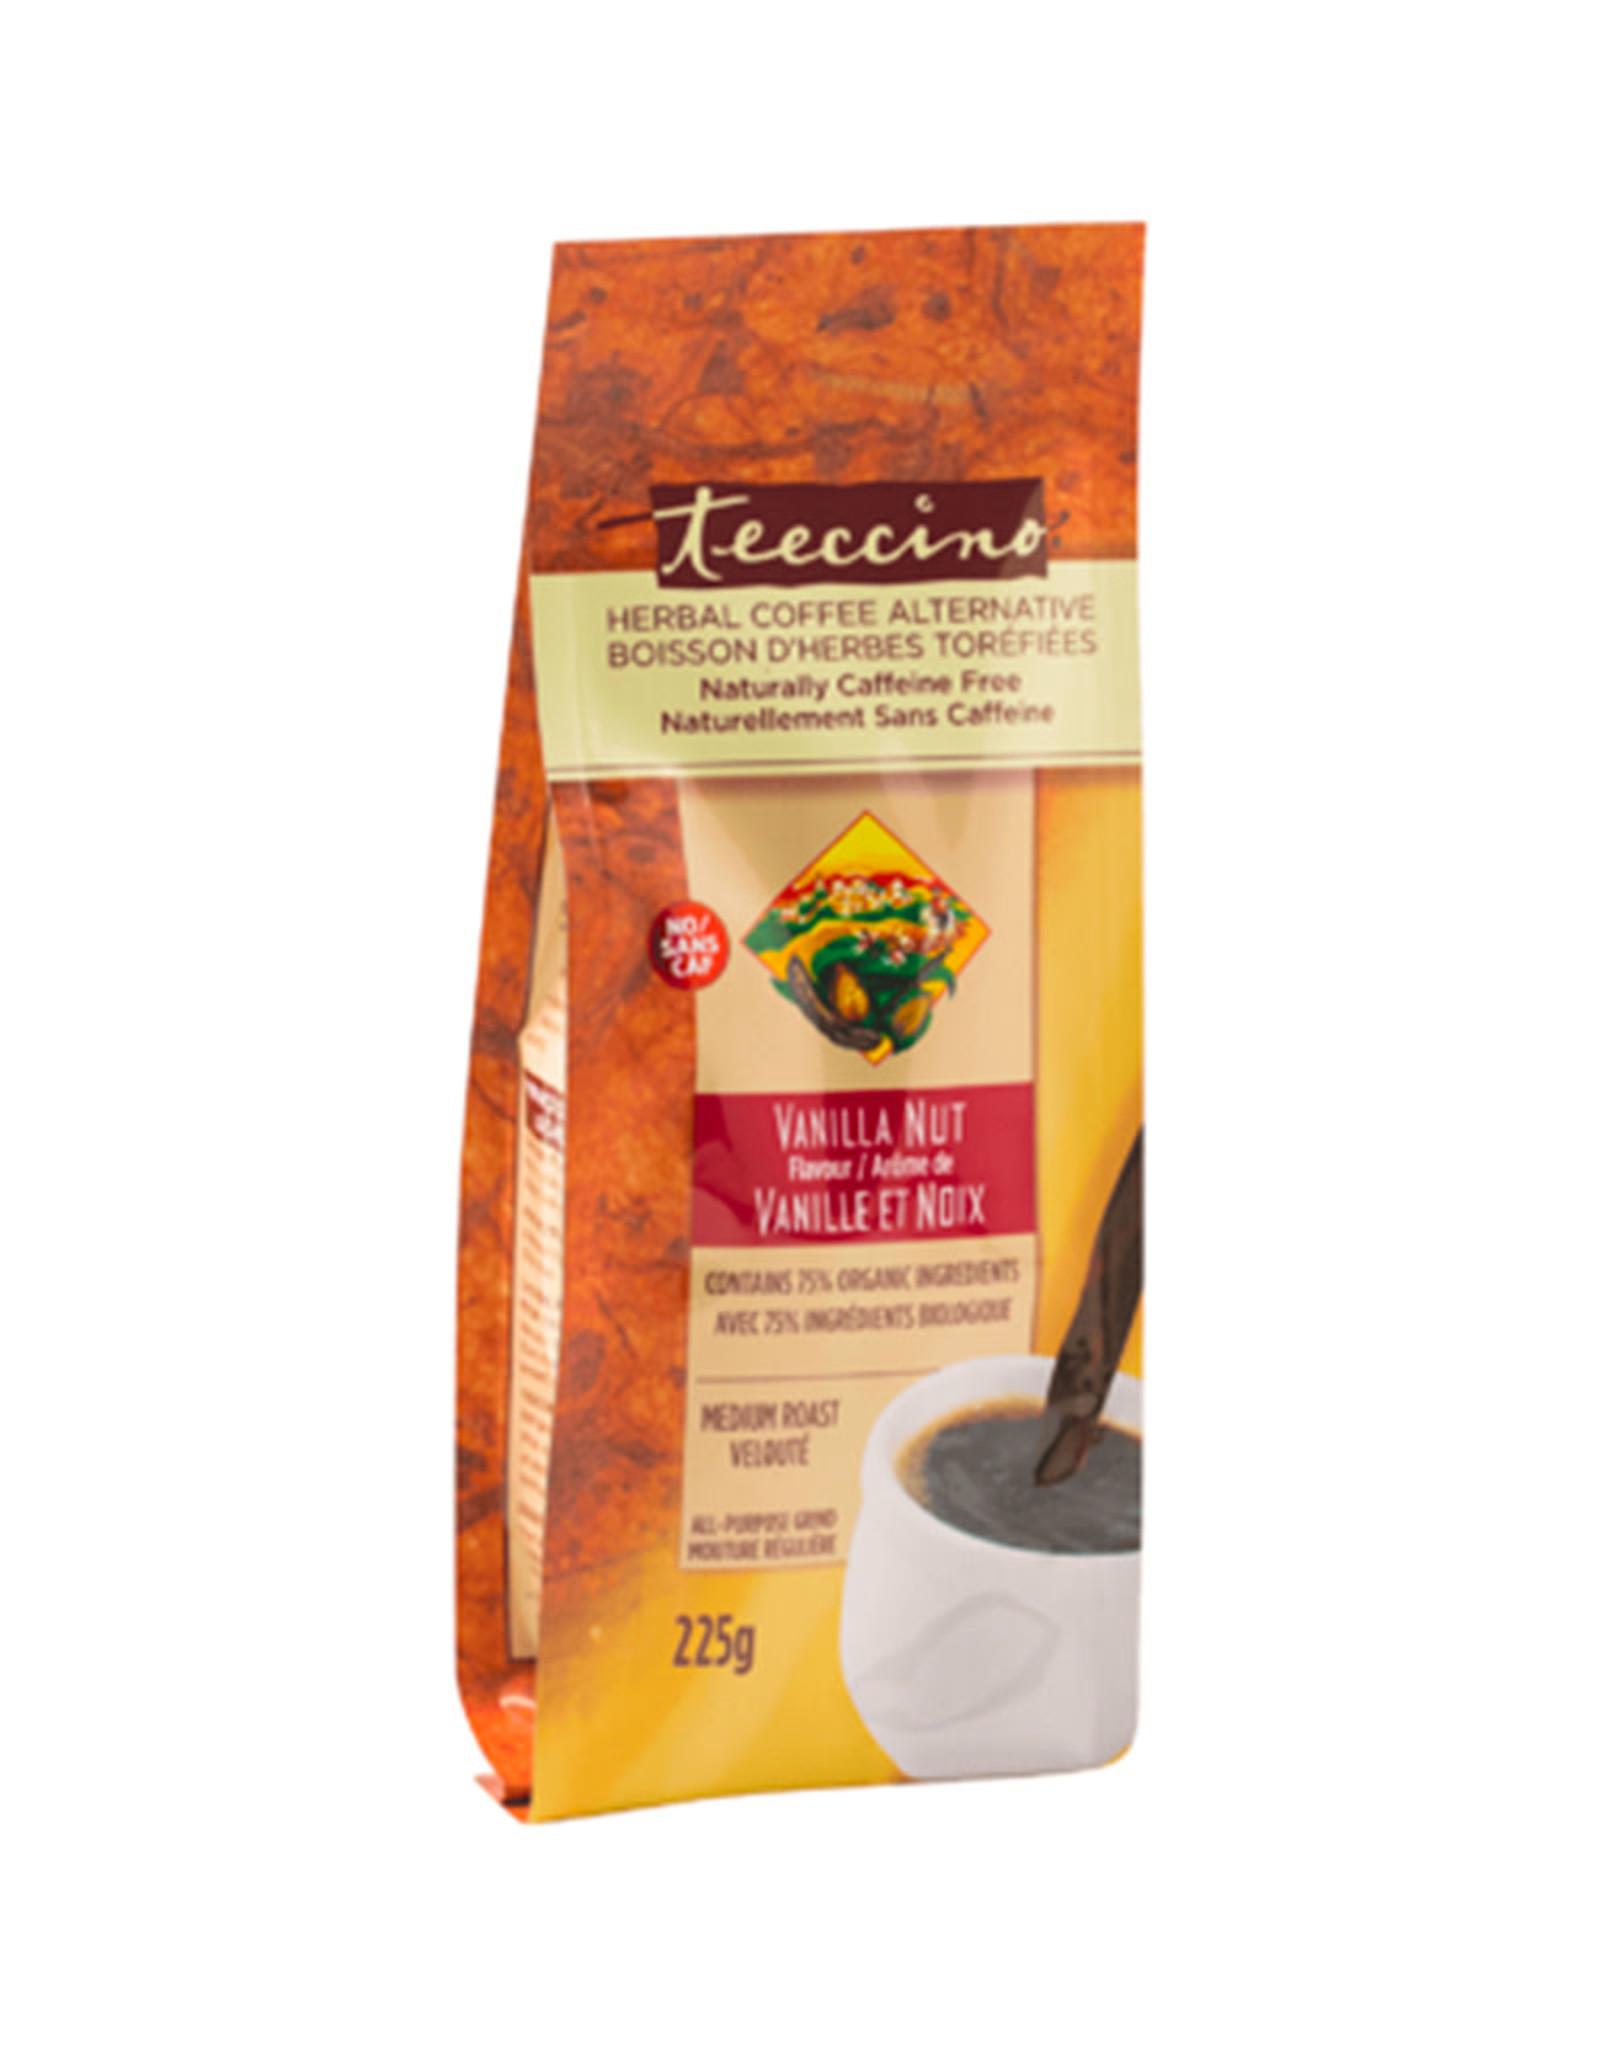 Teeccino Teeccino - Roasted Herbal Coffee, Vanilla Nut